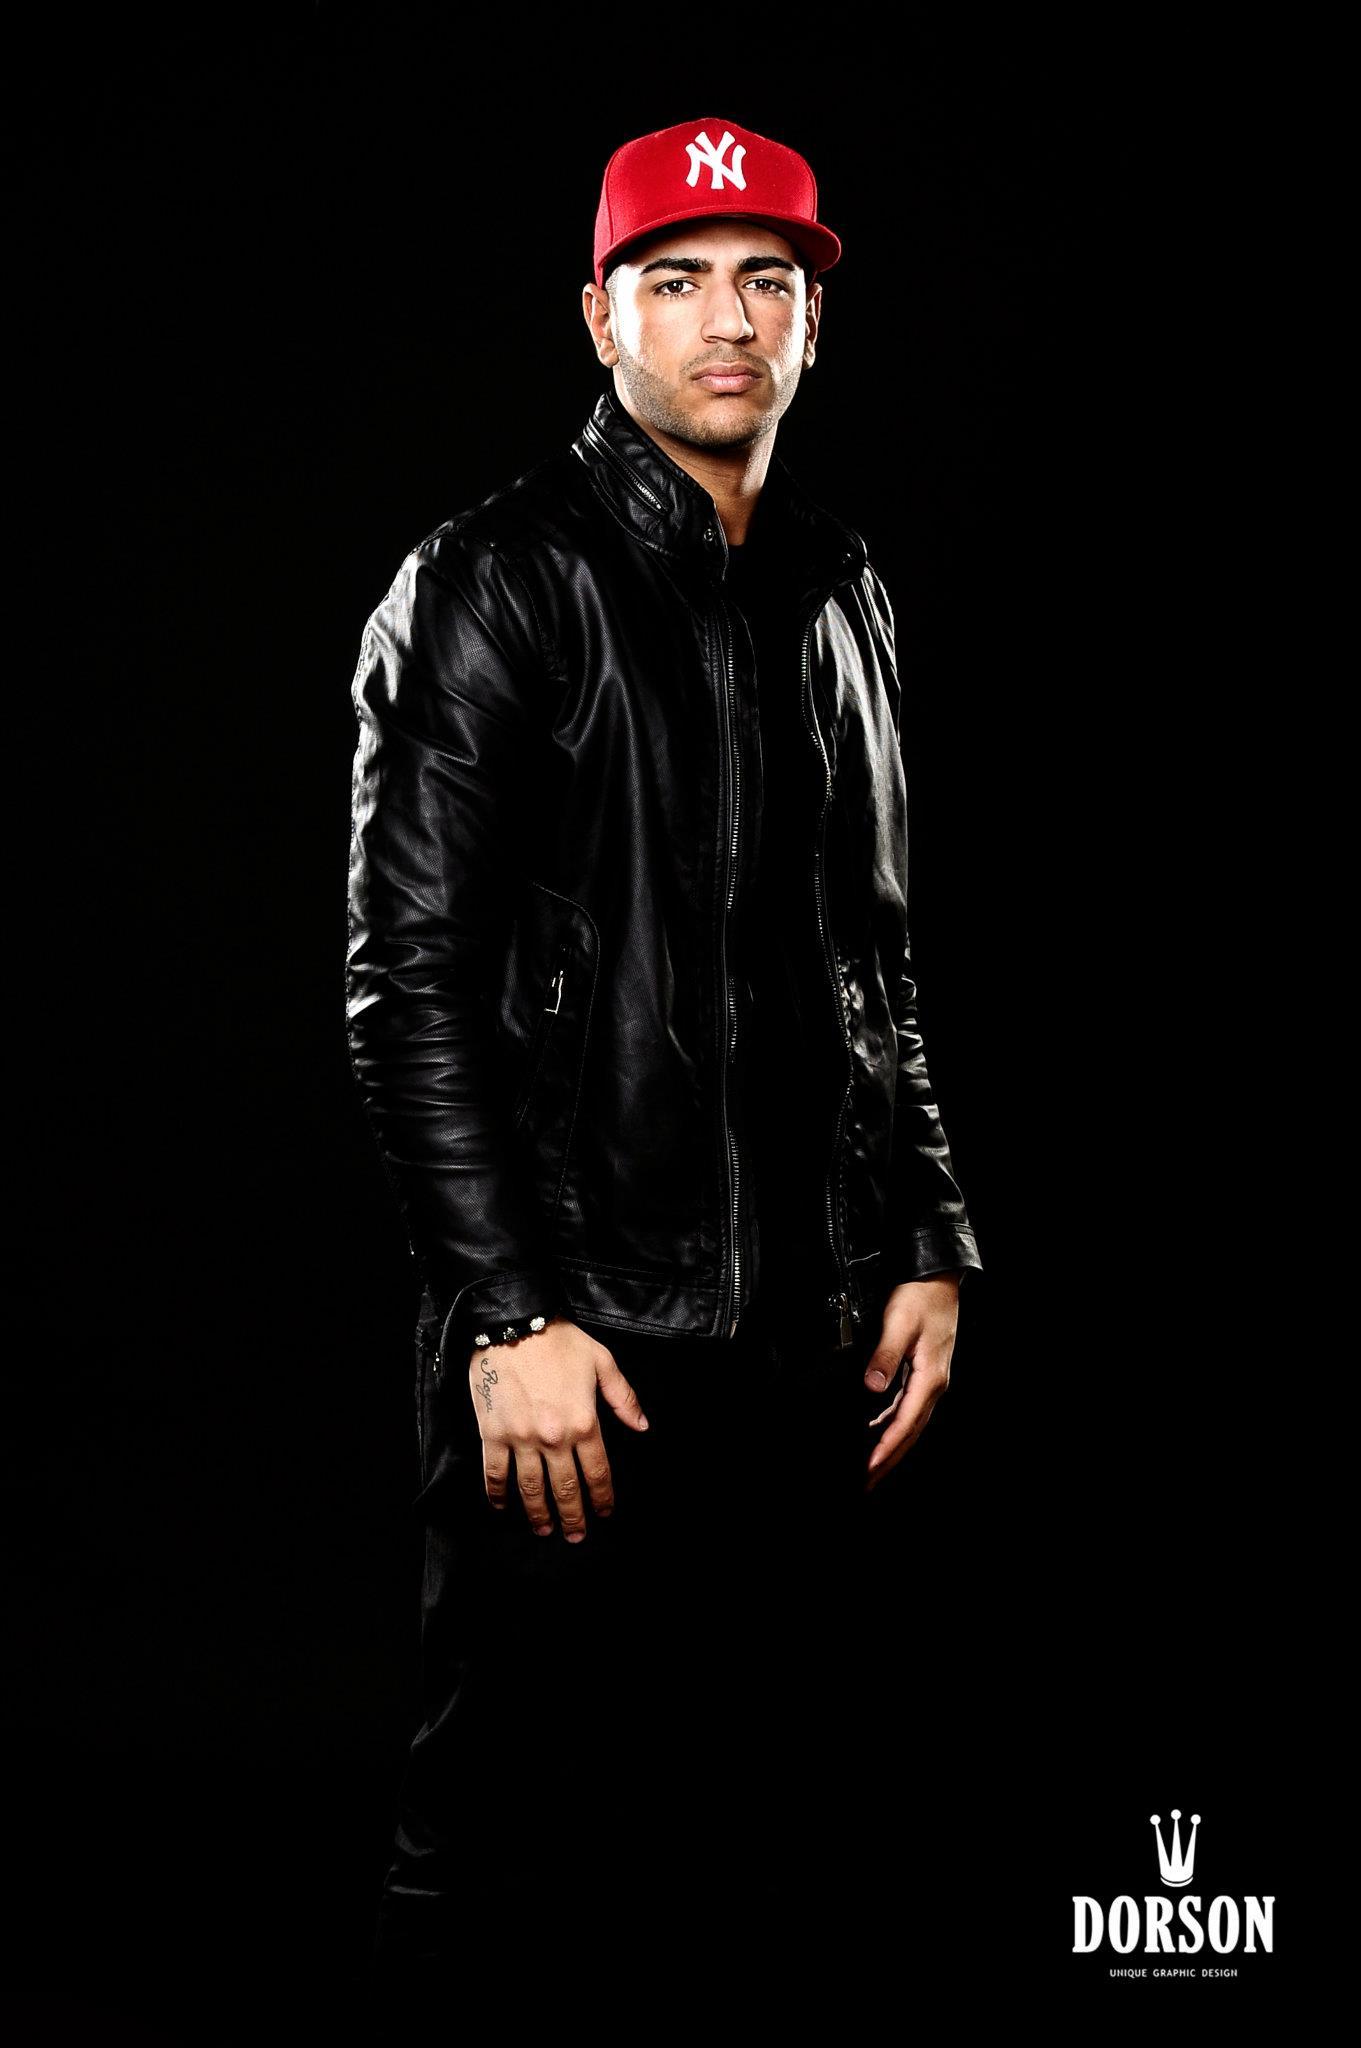 DJ Yeezy